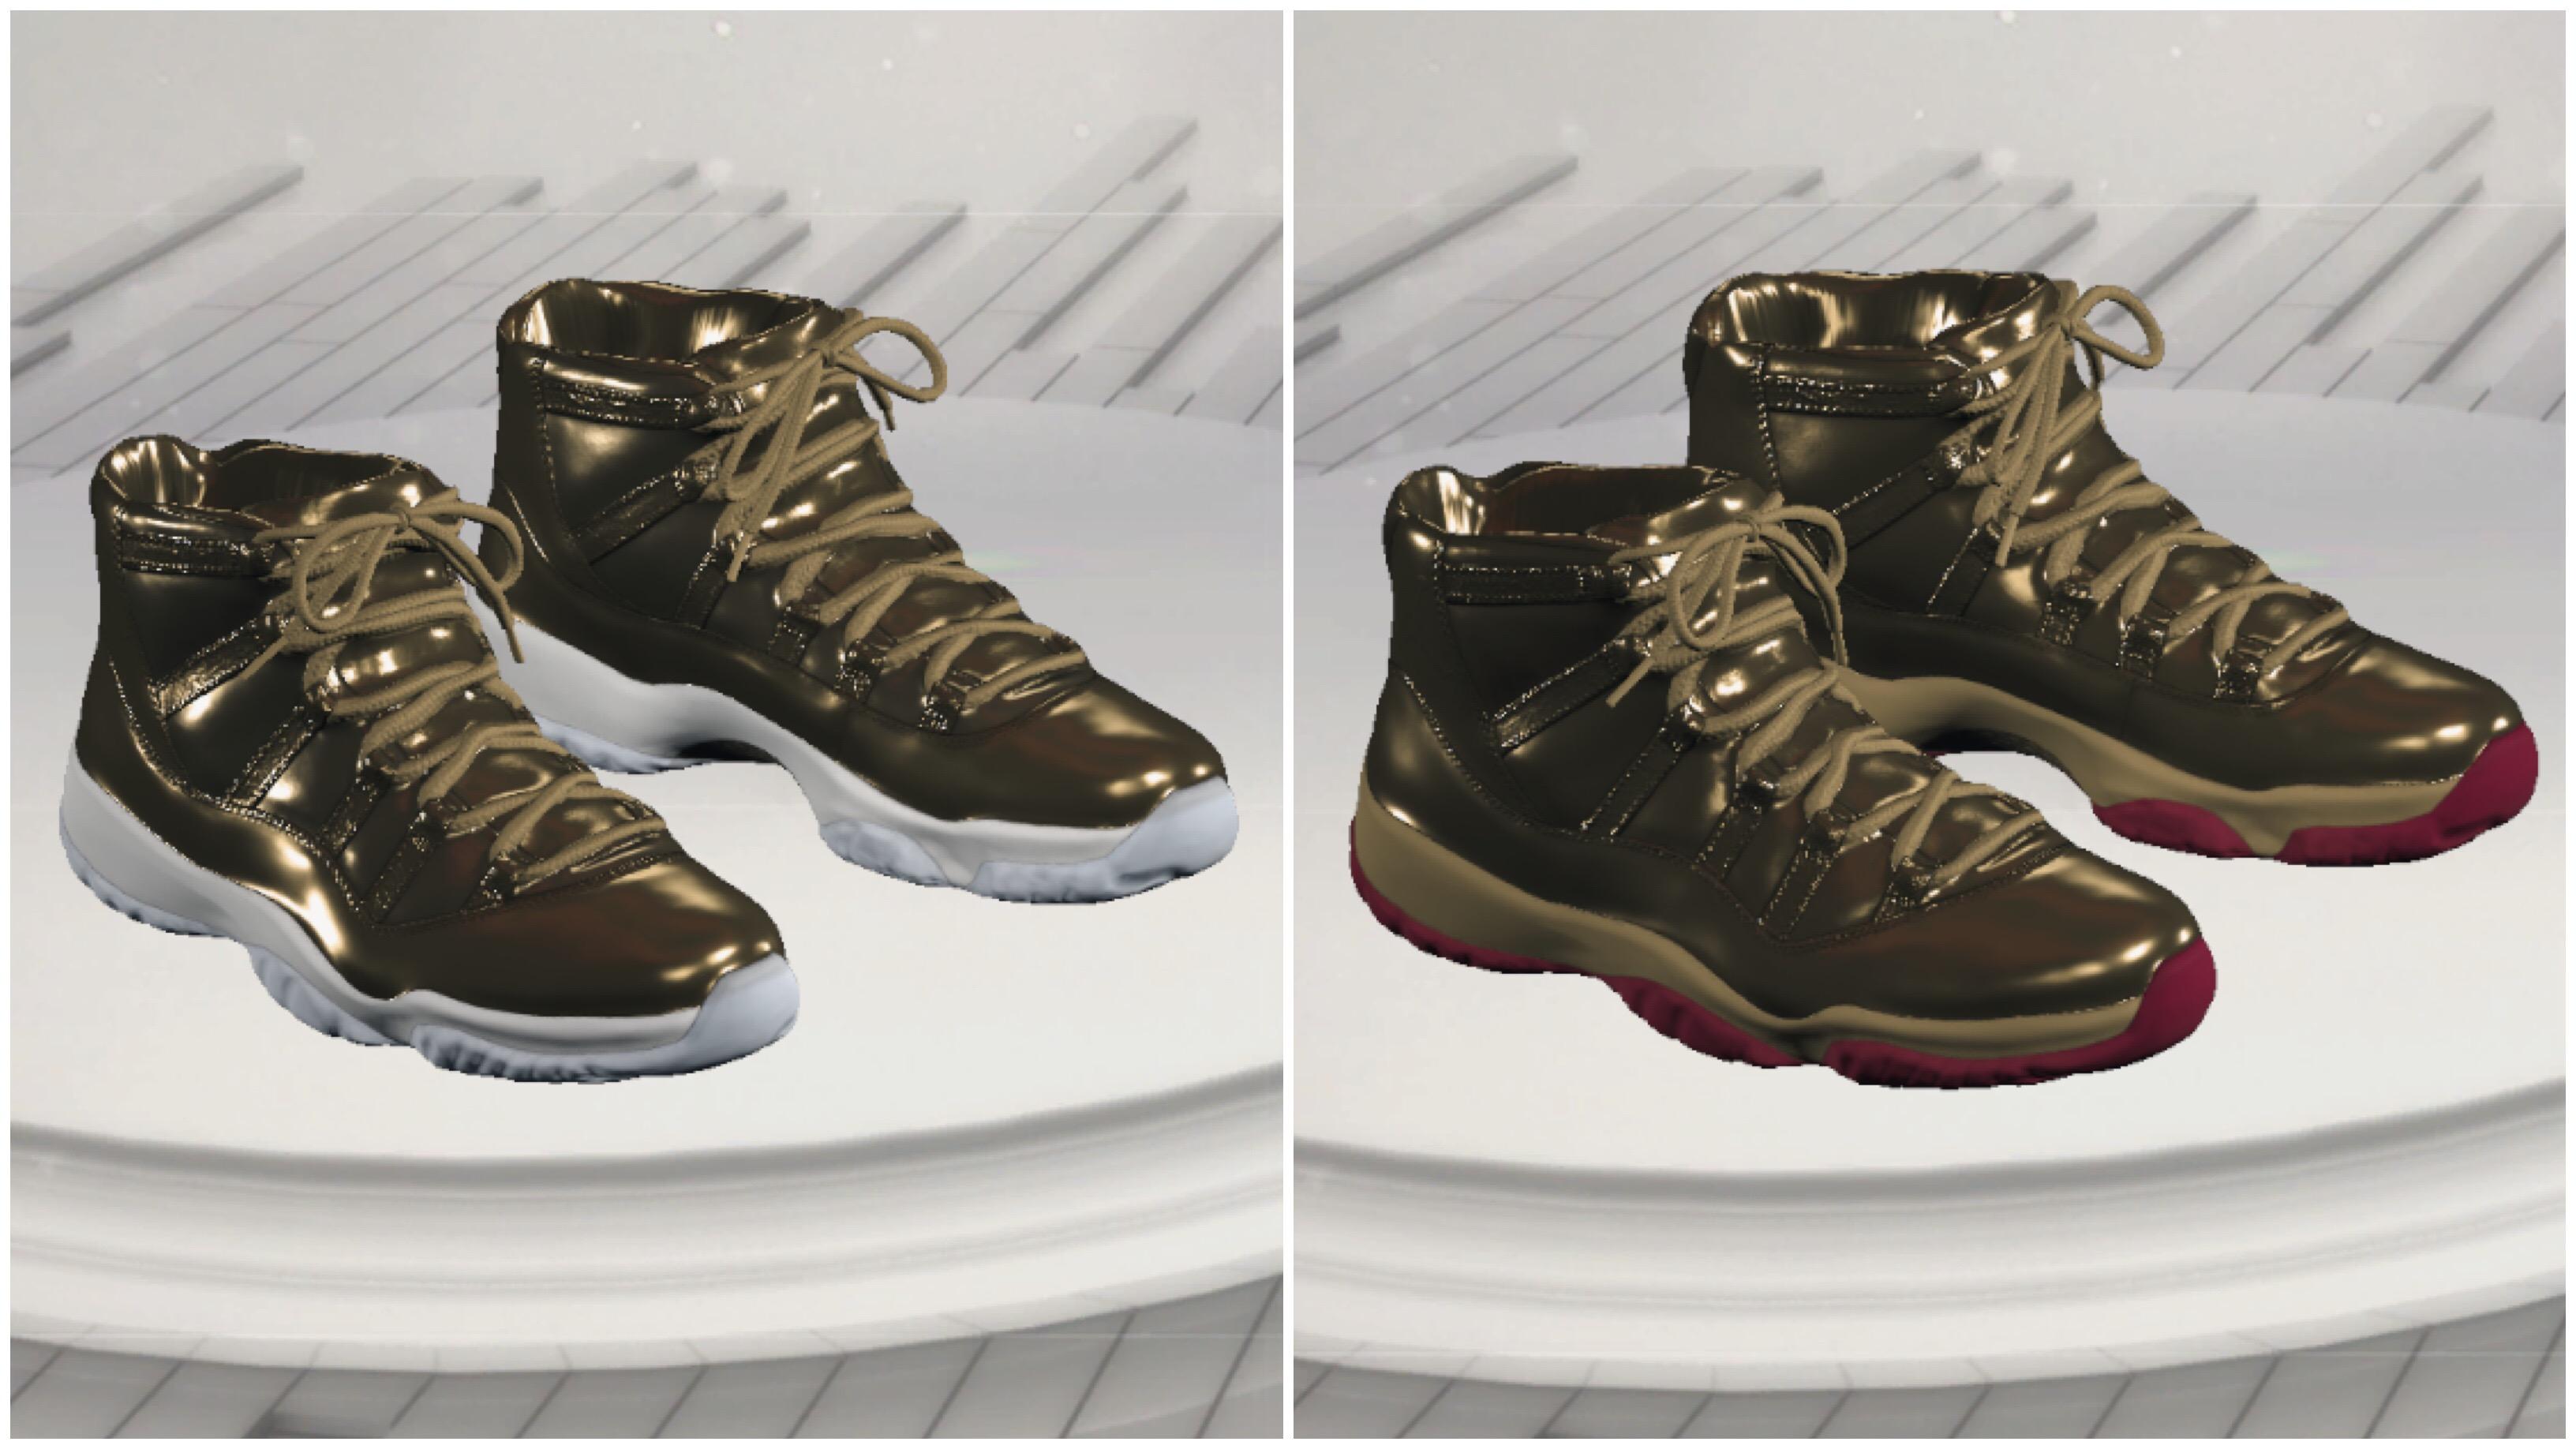 newest edf51 ef848 NBA 2K17 Kicks Air Jordan 11 Gold PE Edition  Kawhi Leonard Vs. Michael  Finley • KicksOnFire.com